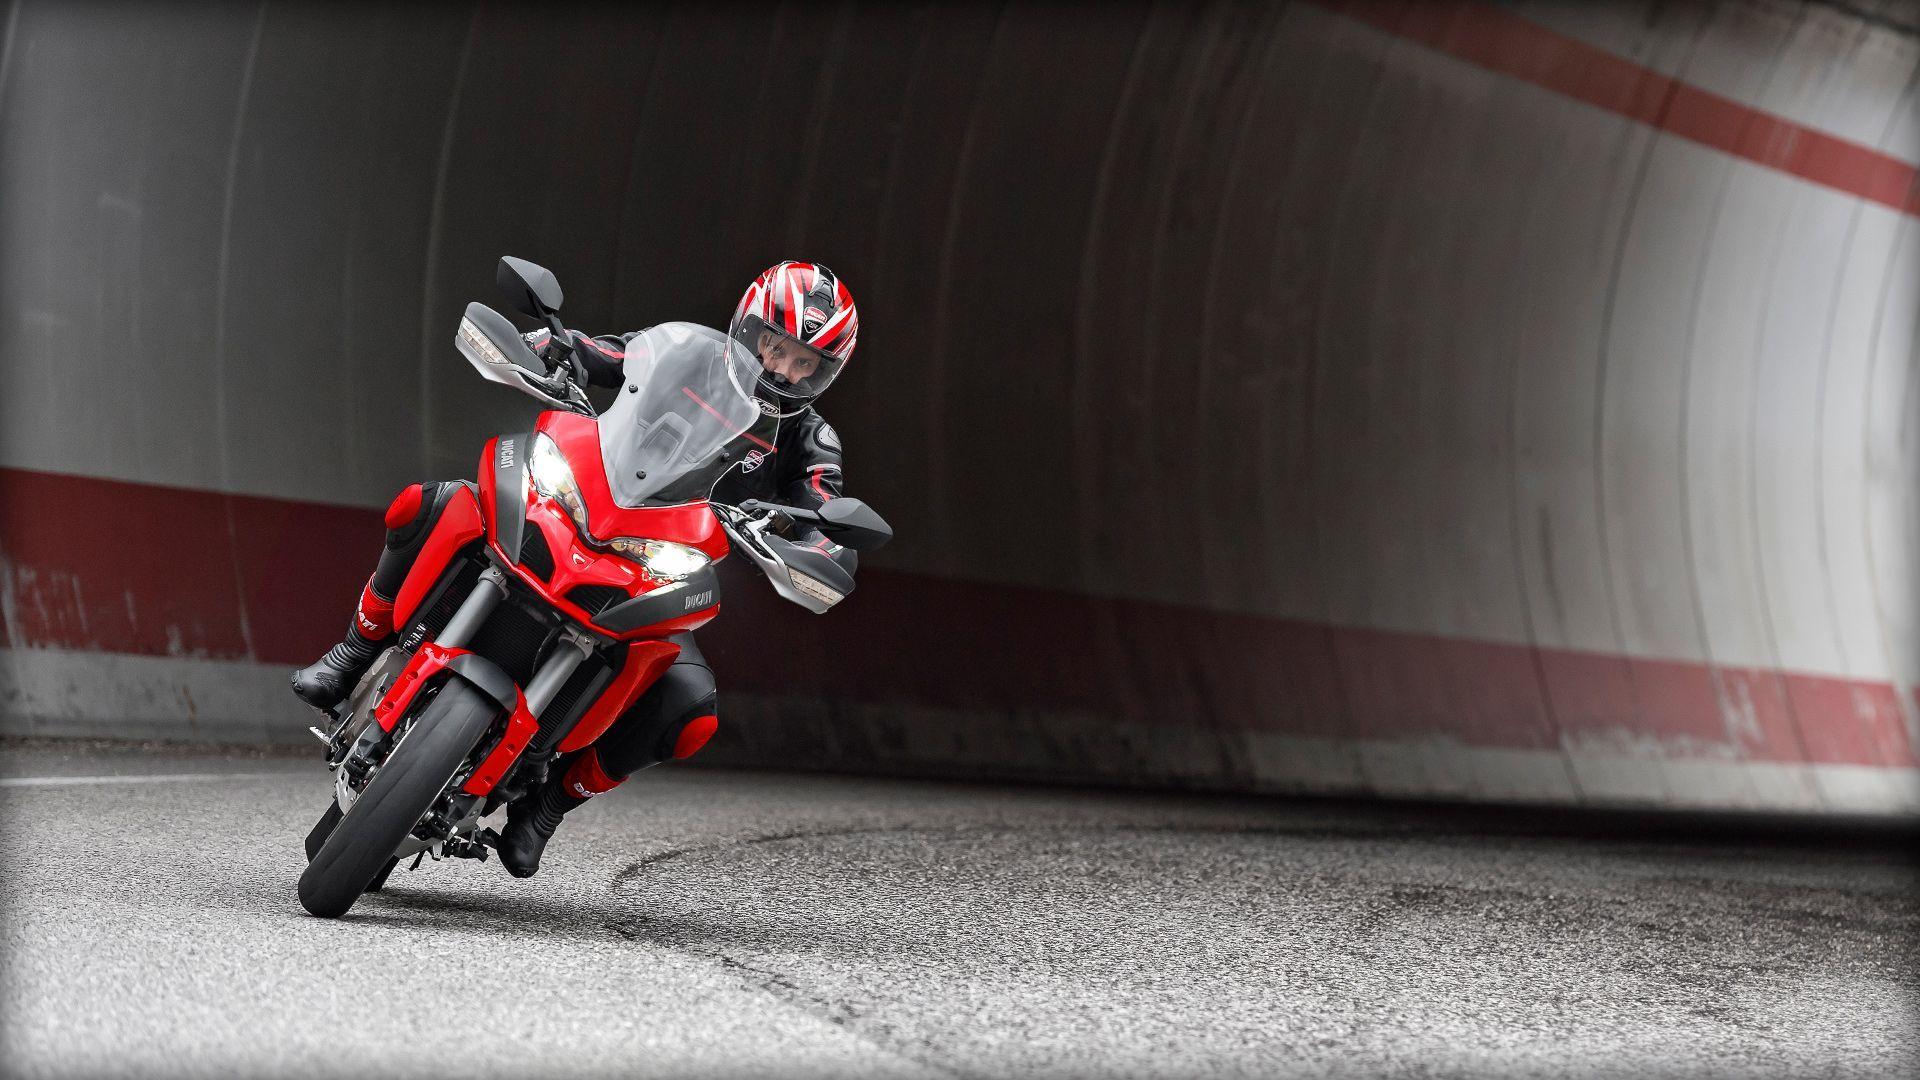 2015 Ducati Multistrada 1200 S | Multistrada 1200 S - Turning